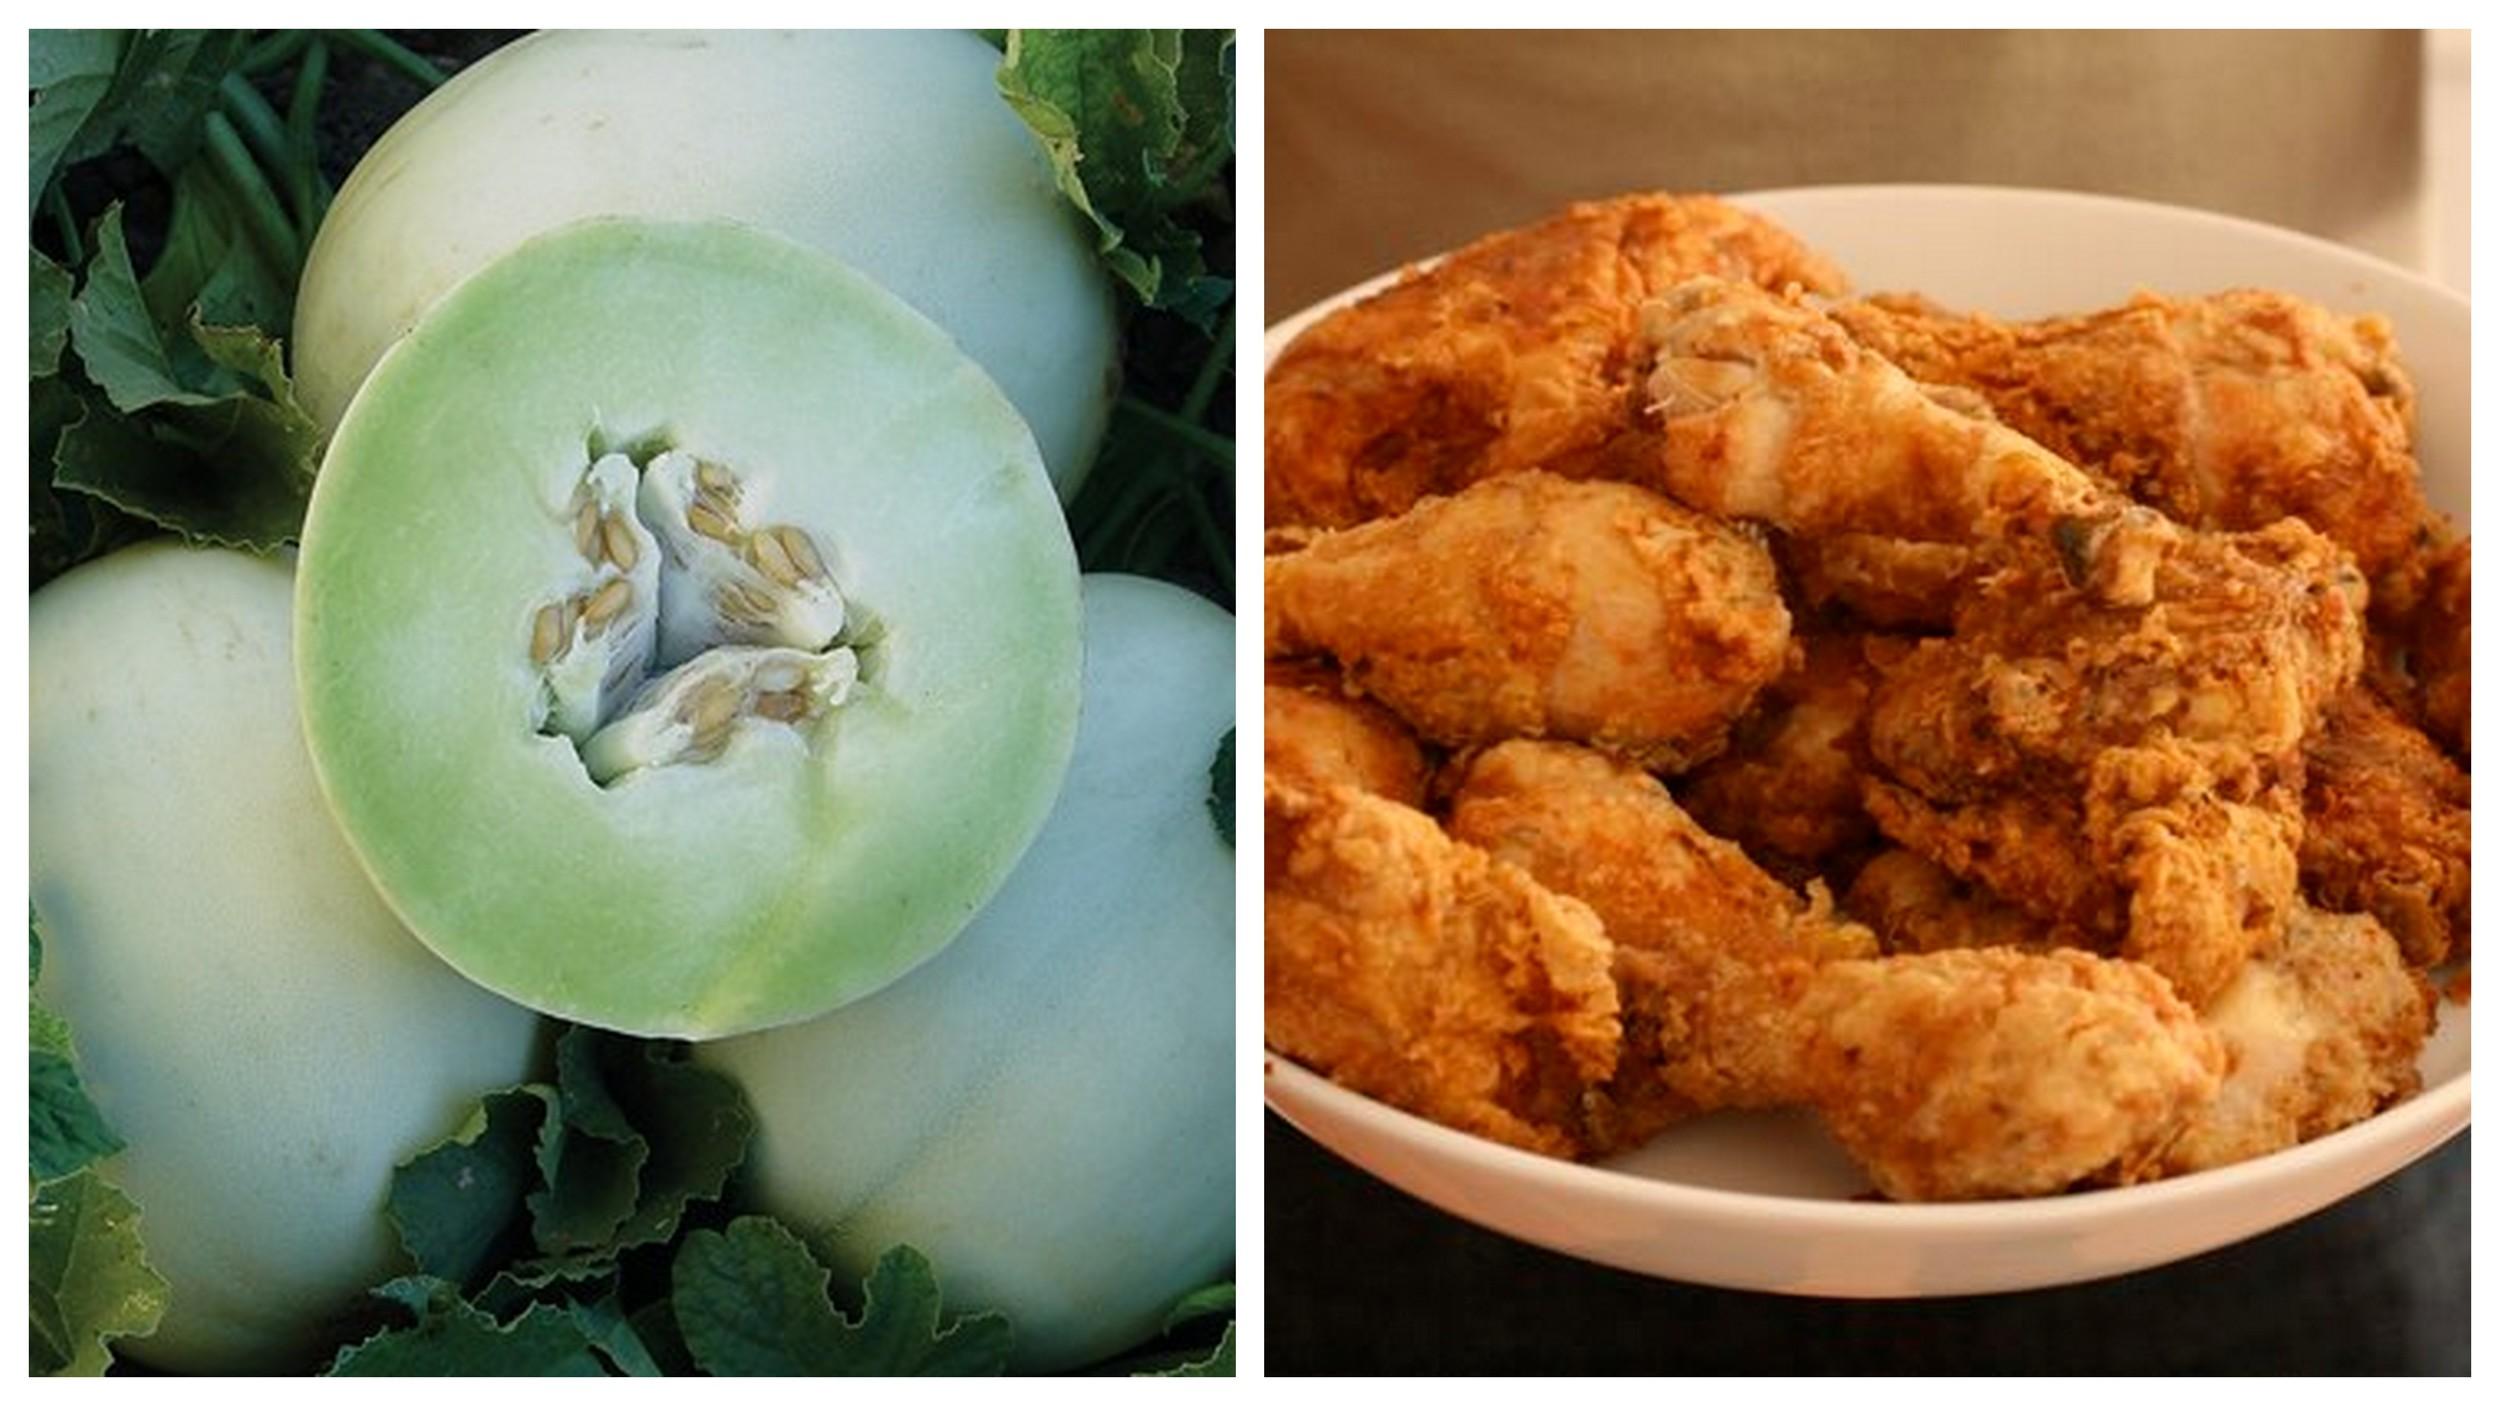 Honeydew melon    and    fried chicken   .